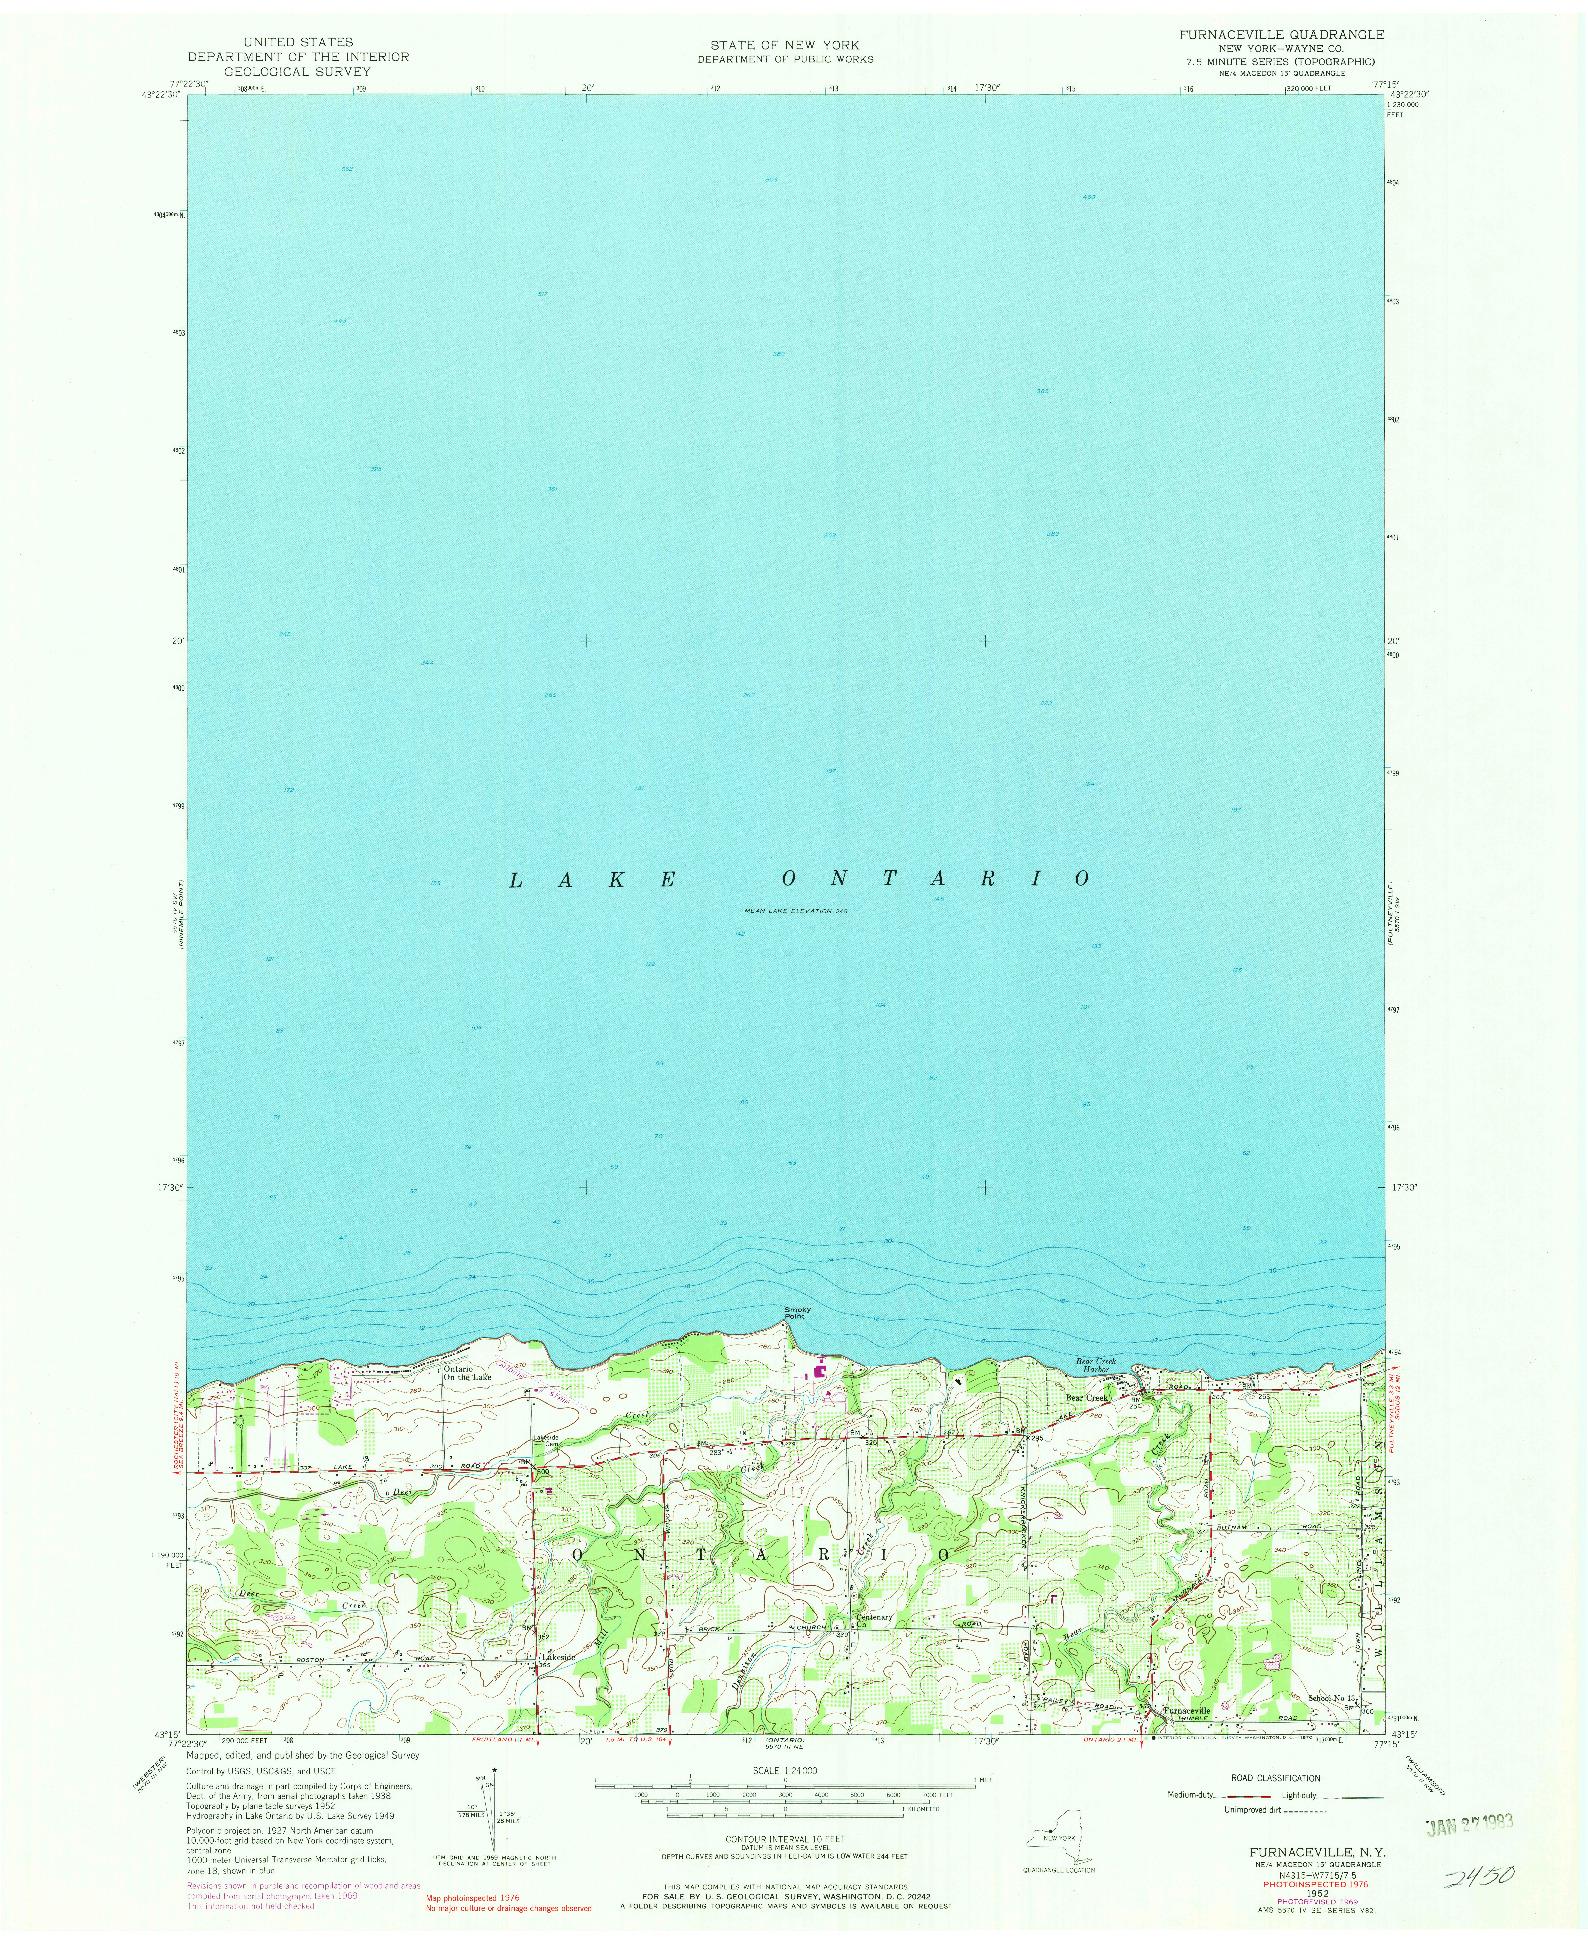 USGS 1:24000-SCALE QUADRANGLE FOR FURNACEVILLE, NY 1952